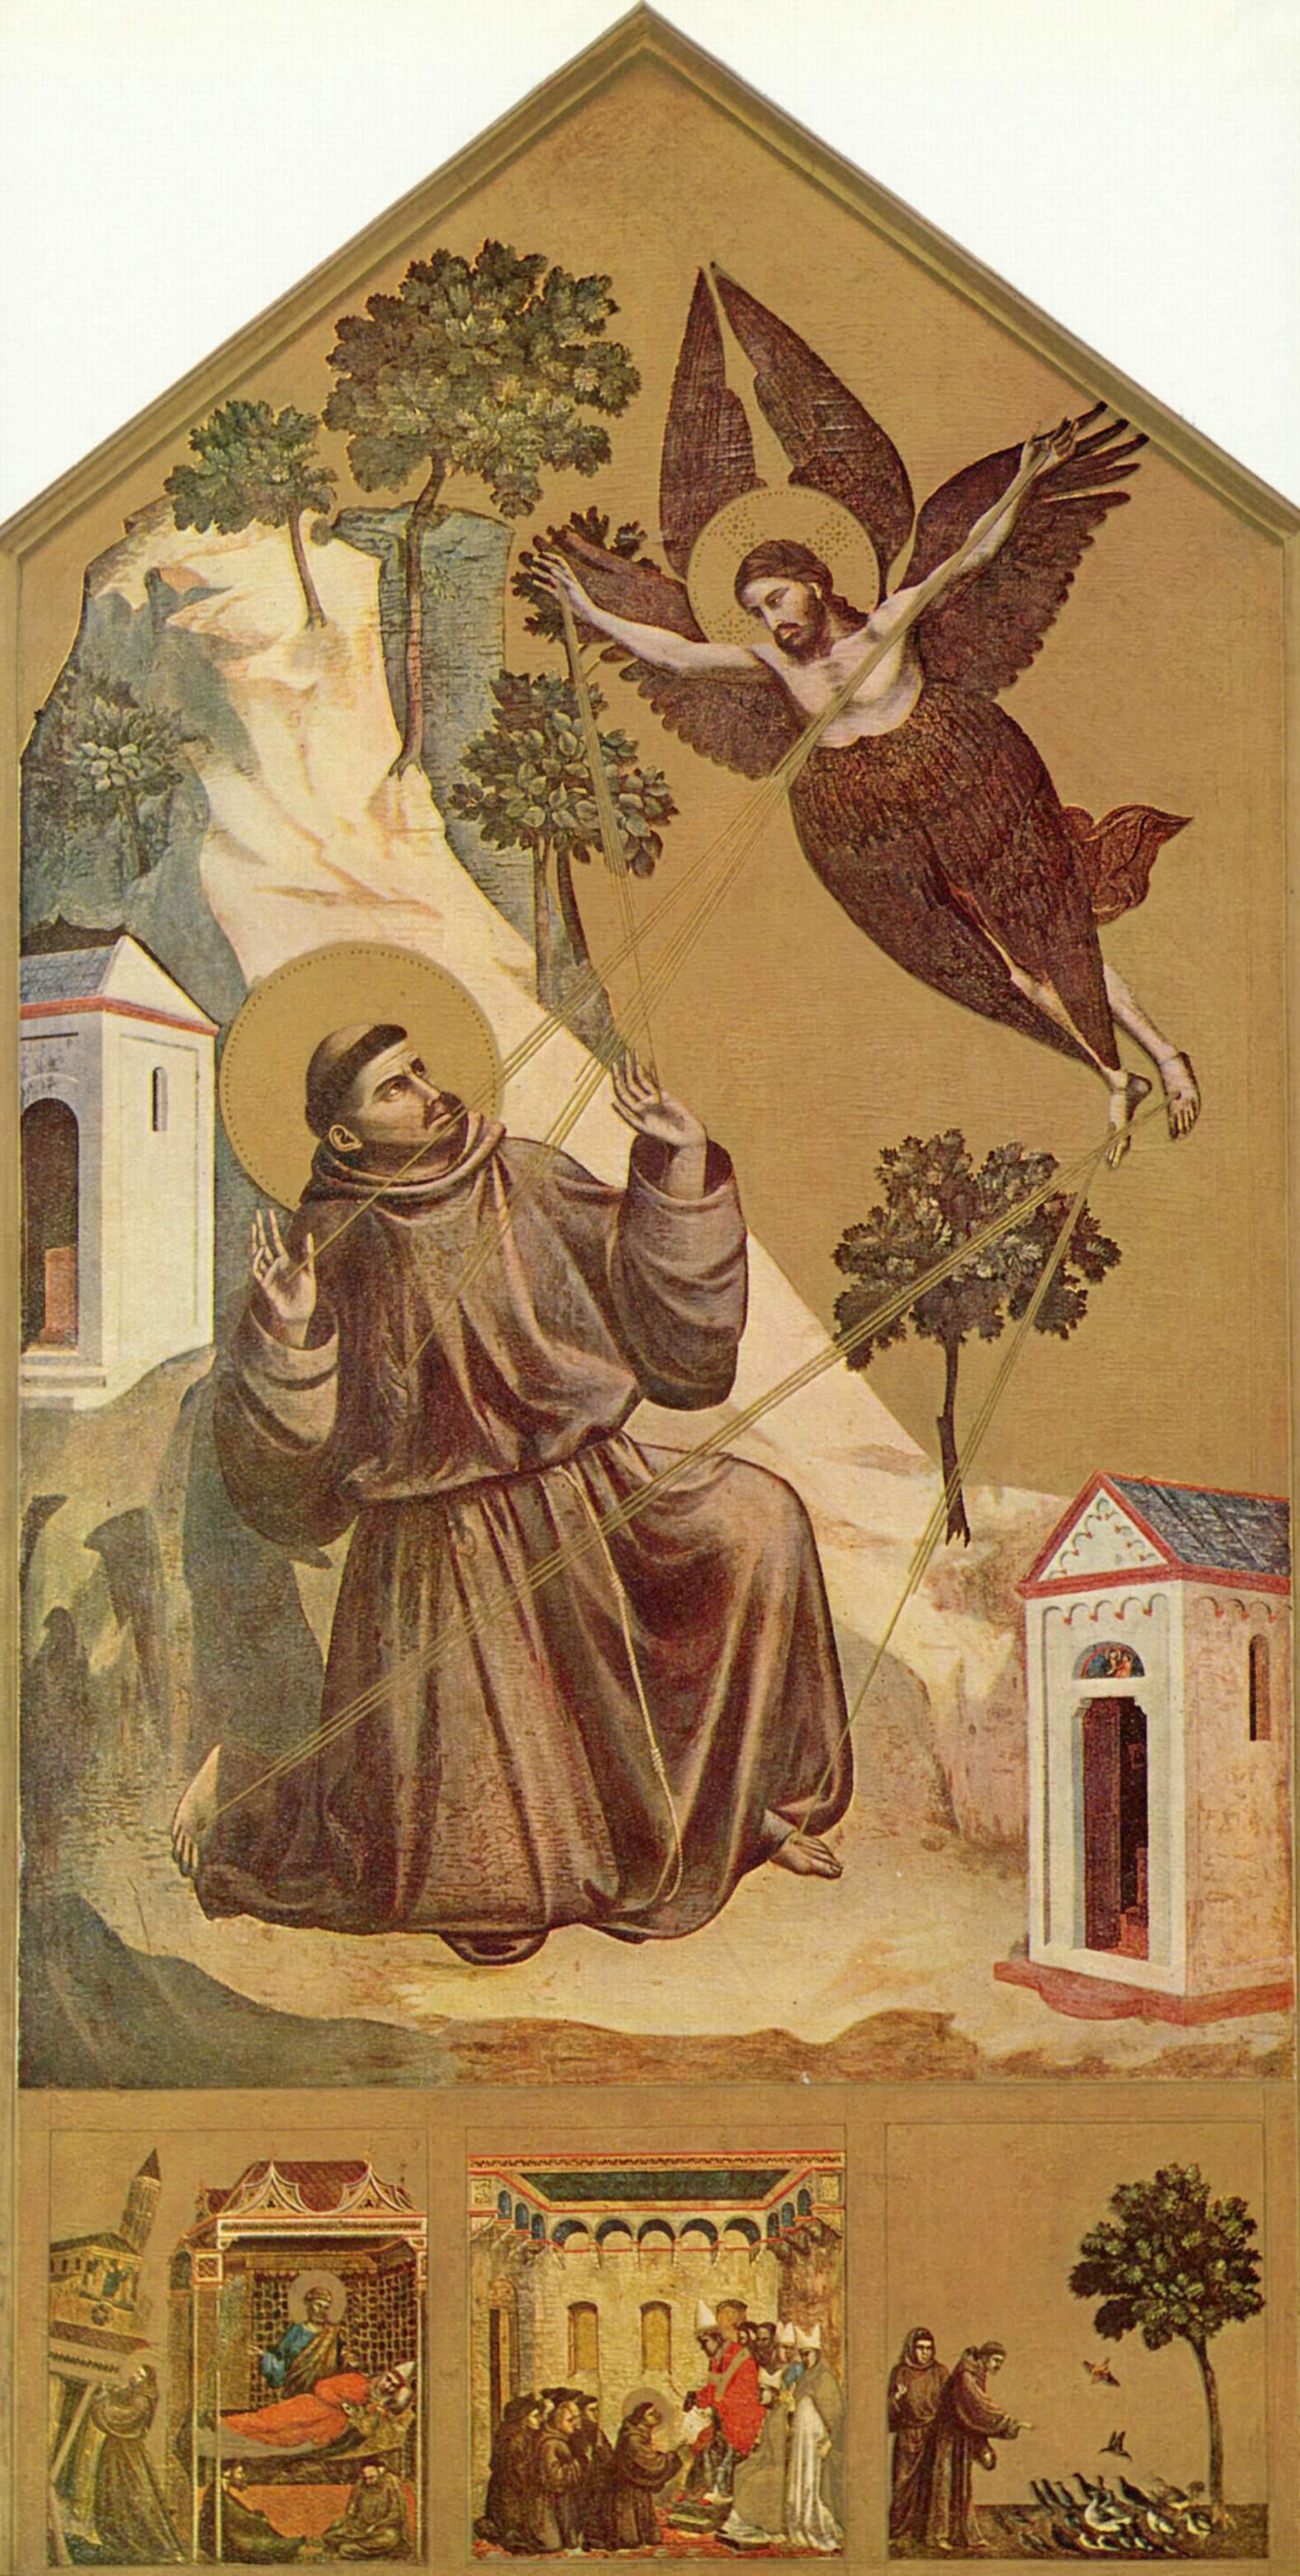 Стигматизация св. Франциска, Джотто ди Бондоне